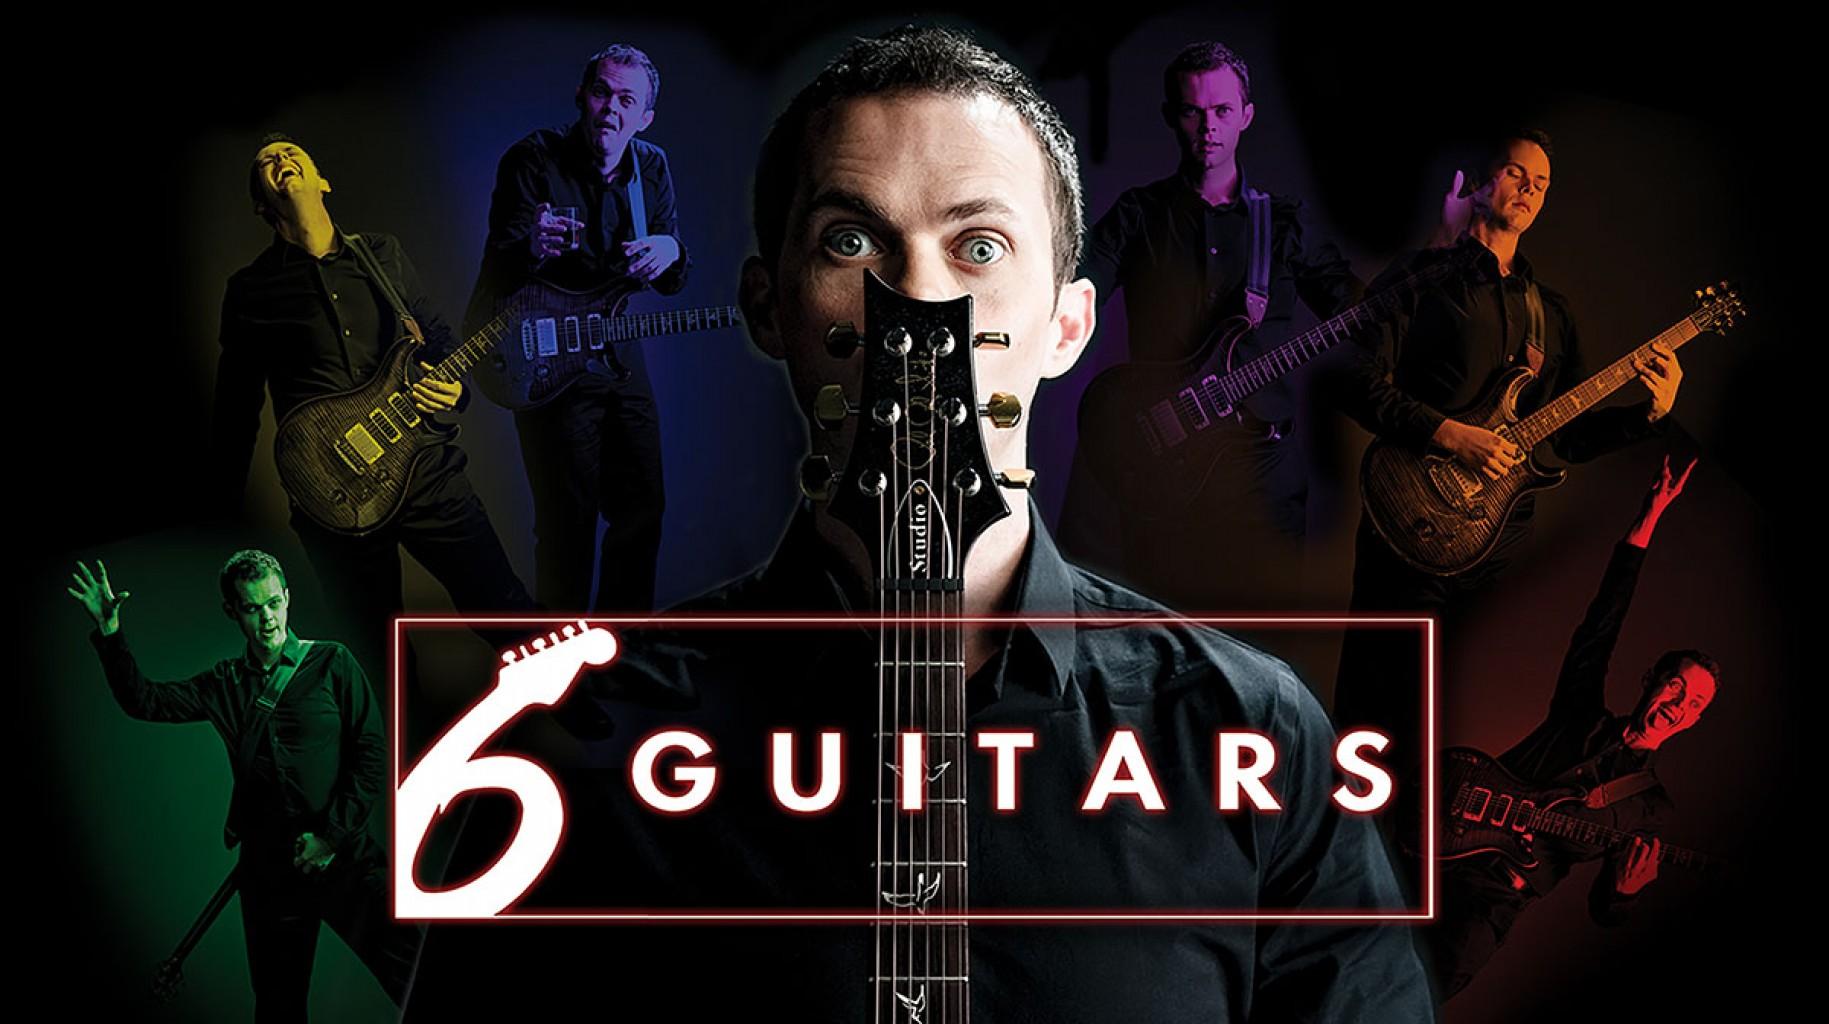 """6 Guitars"" to perform at OCCC April 9"